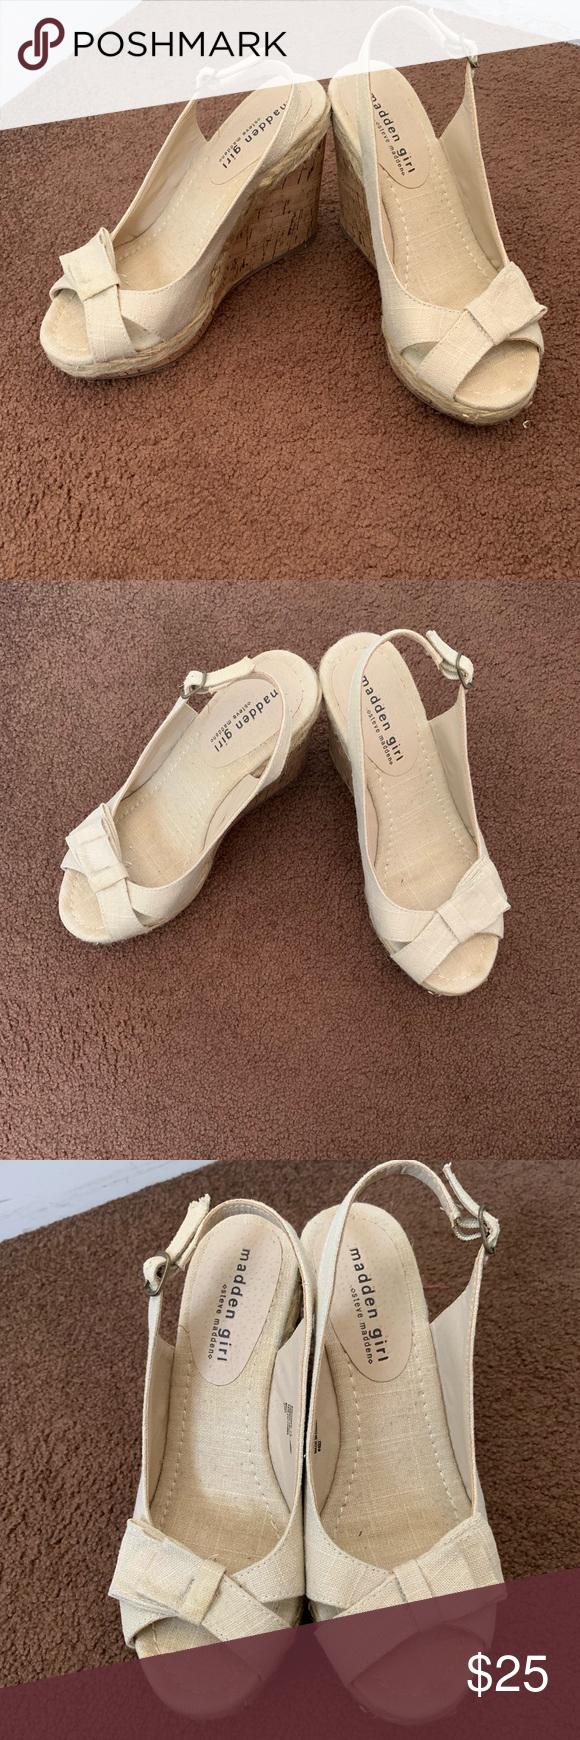 Madden girl shoes, Tan wedges, Wedge heels